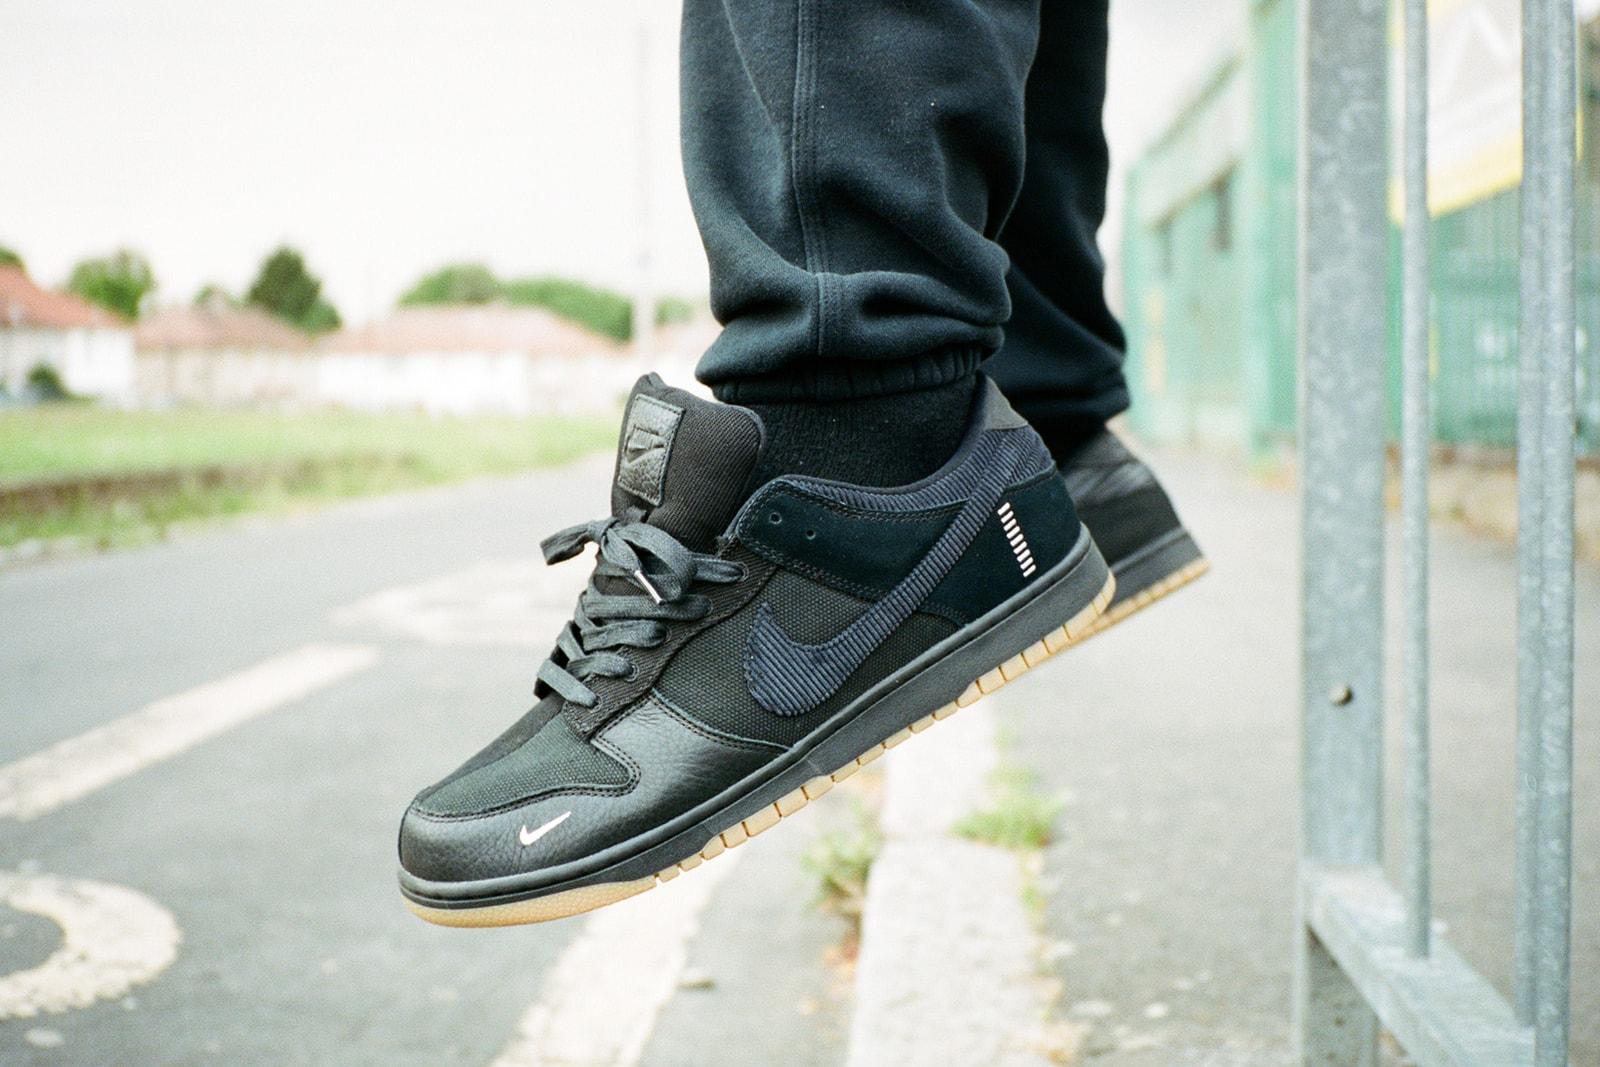 CLOT x Nike Air VaporMax Flyknit